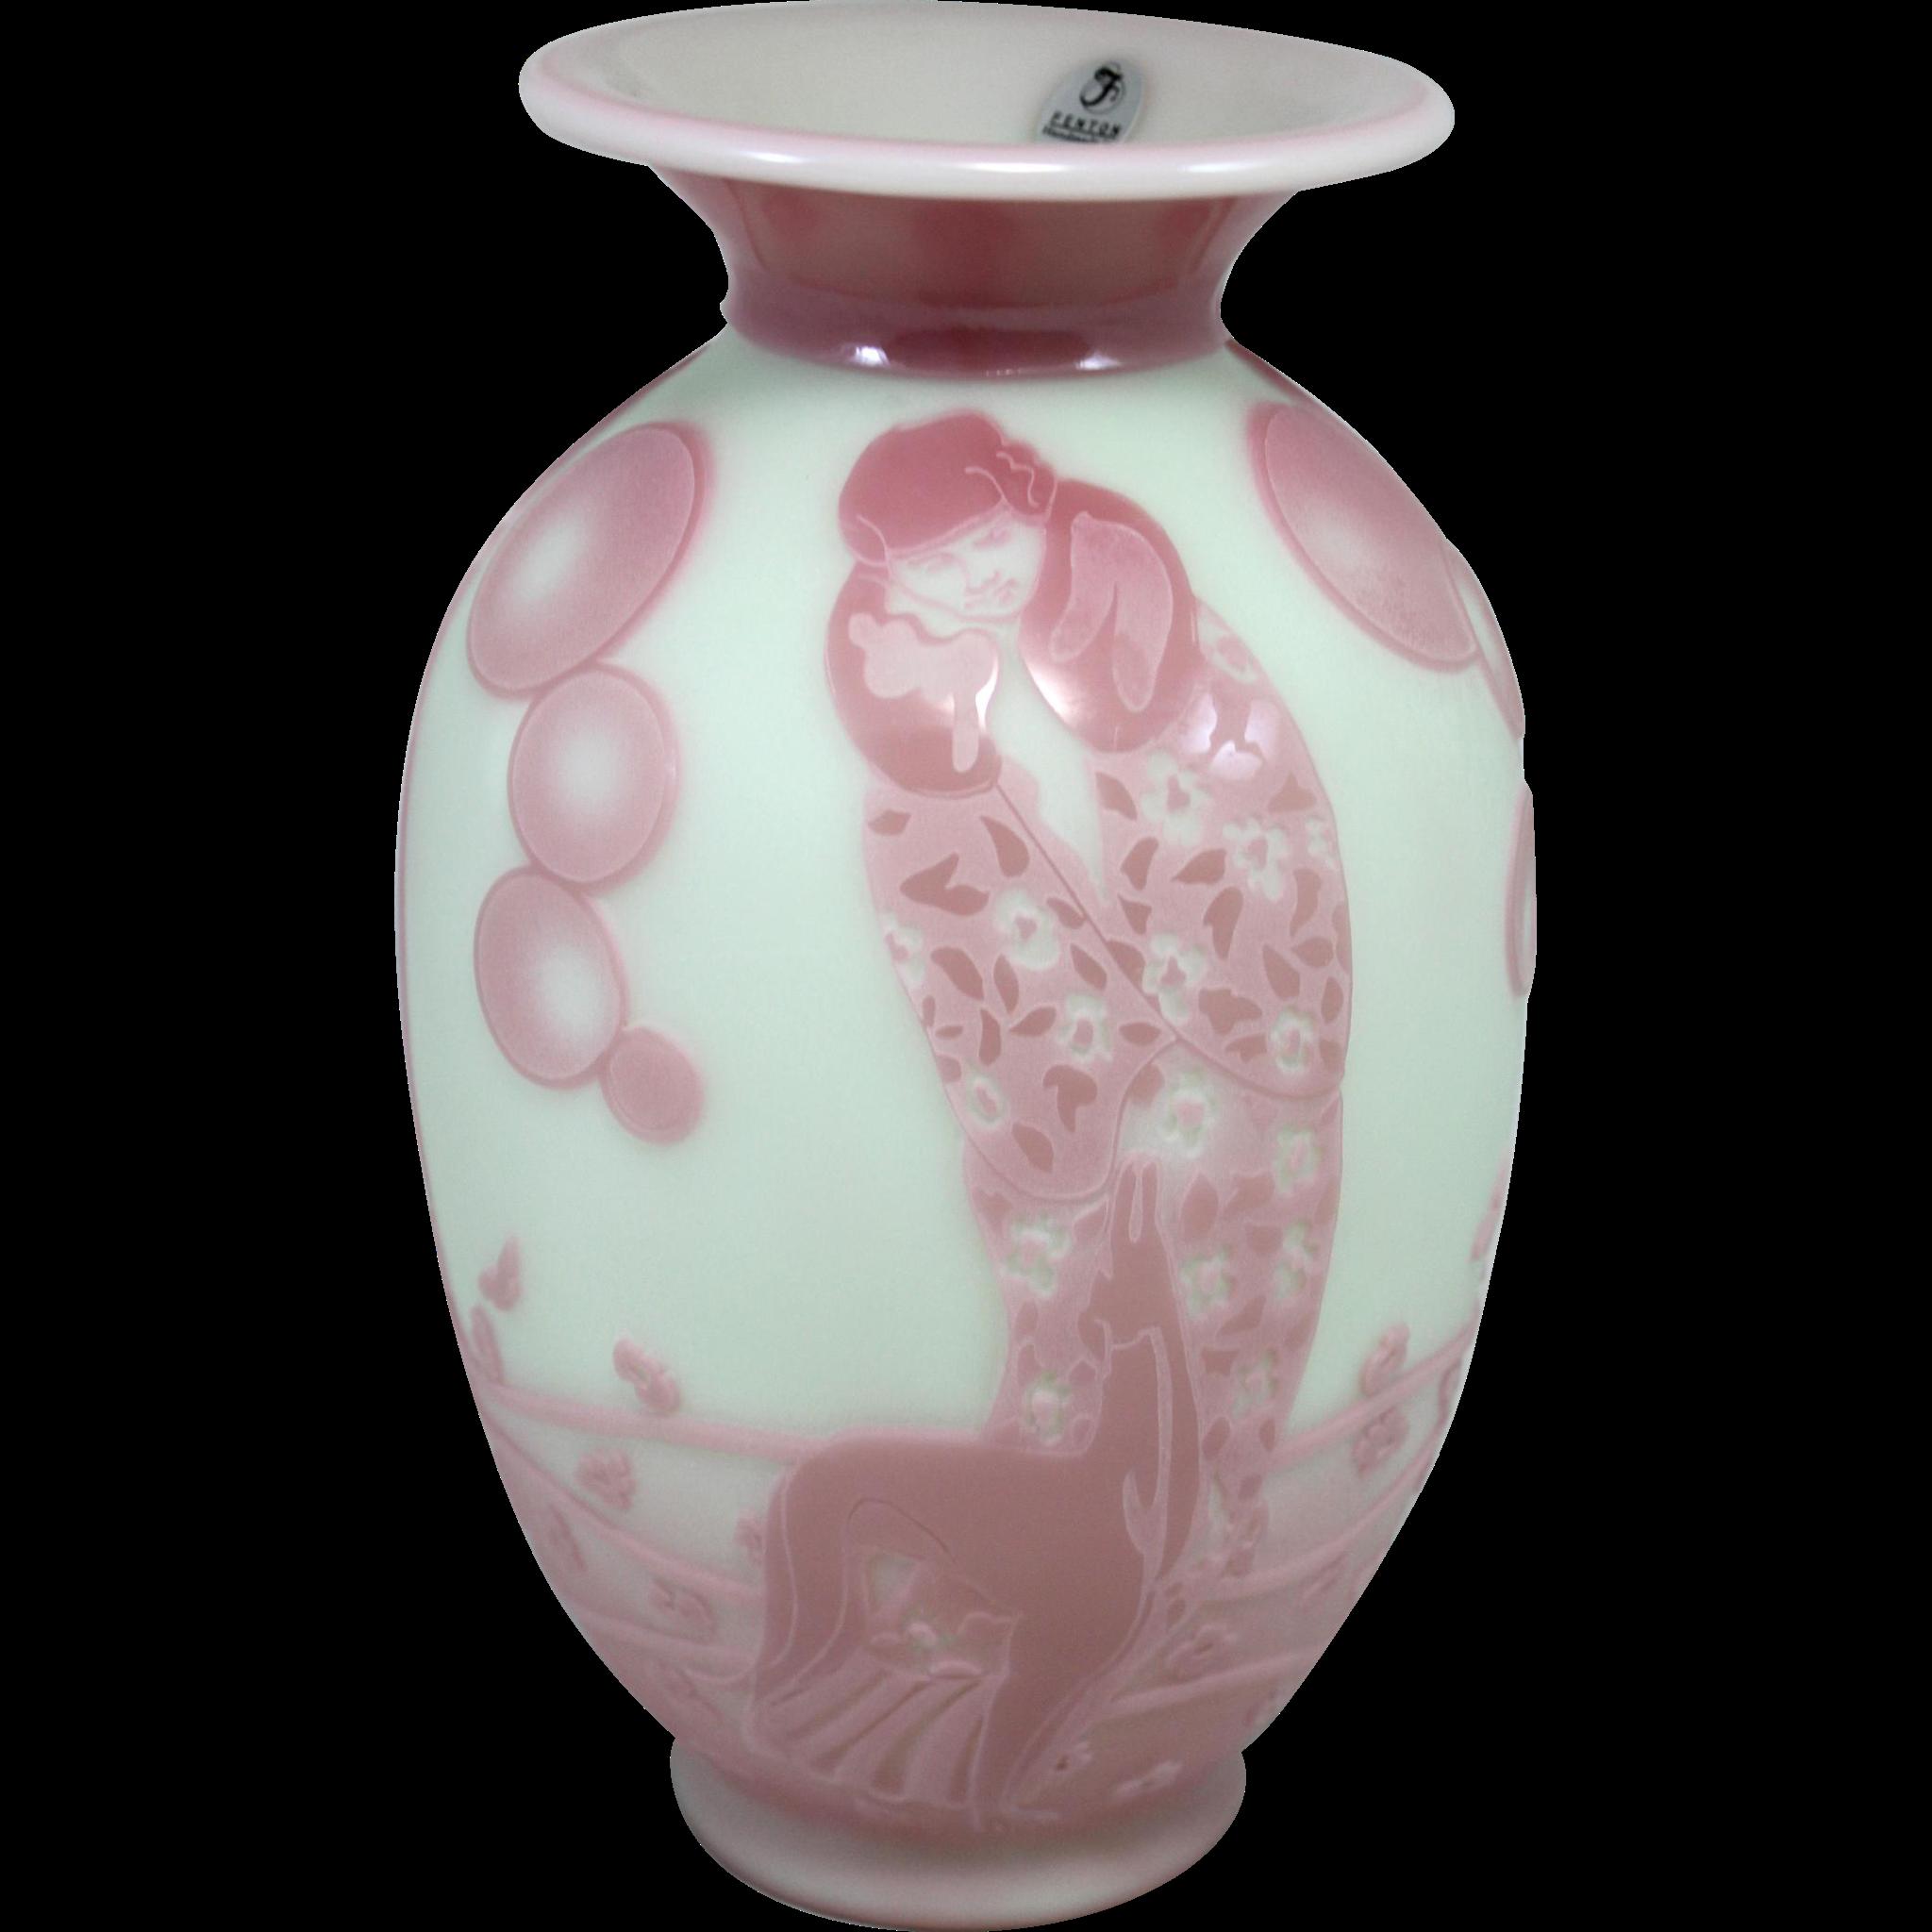 Fenton Art Glass Sand Carved Lotus Mist Burmese Vase - Dog & Dame 33/325